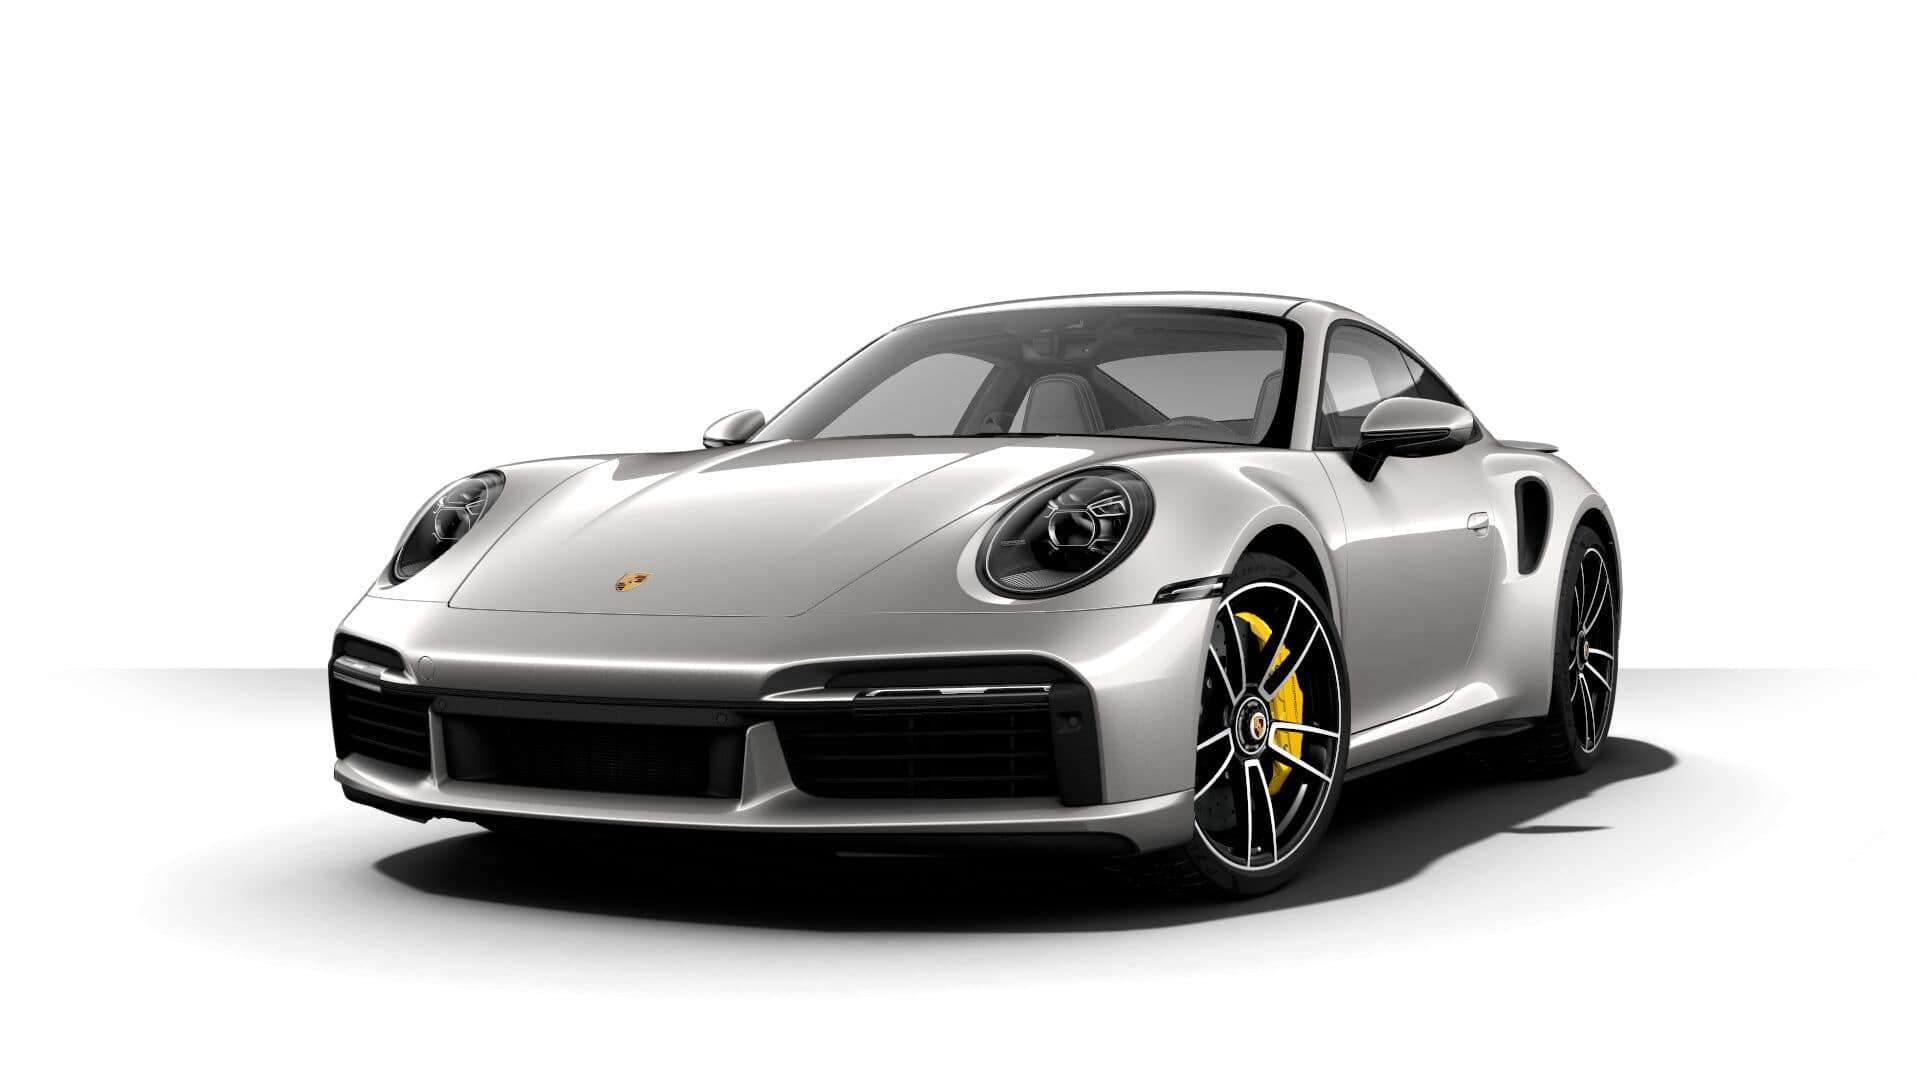 2021 Porsche 911 Turbo S Trim Model Information | Porsche St. Paul